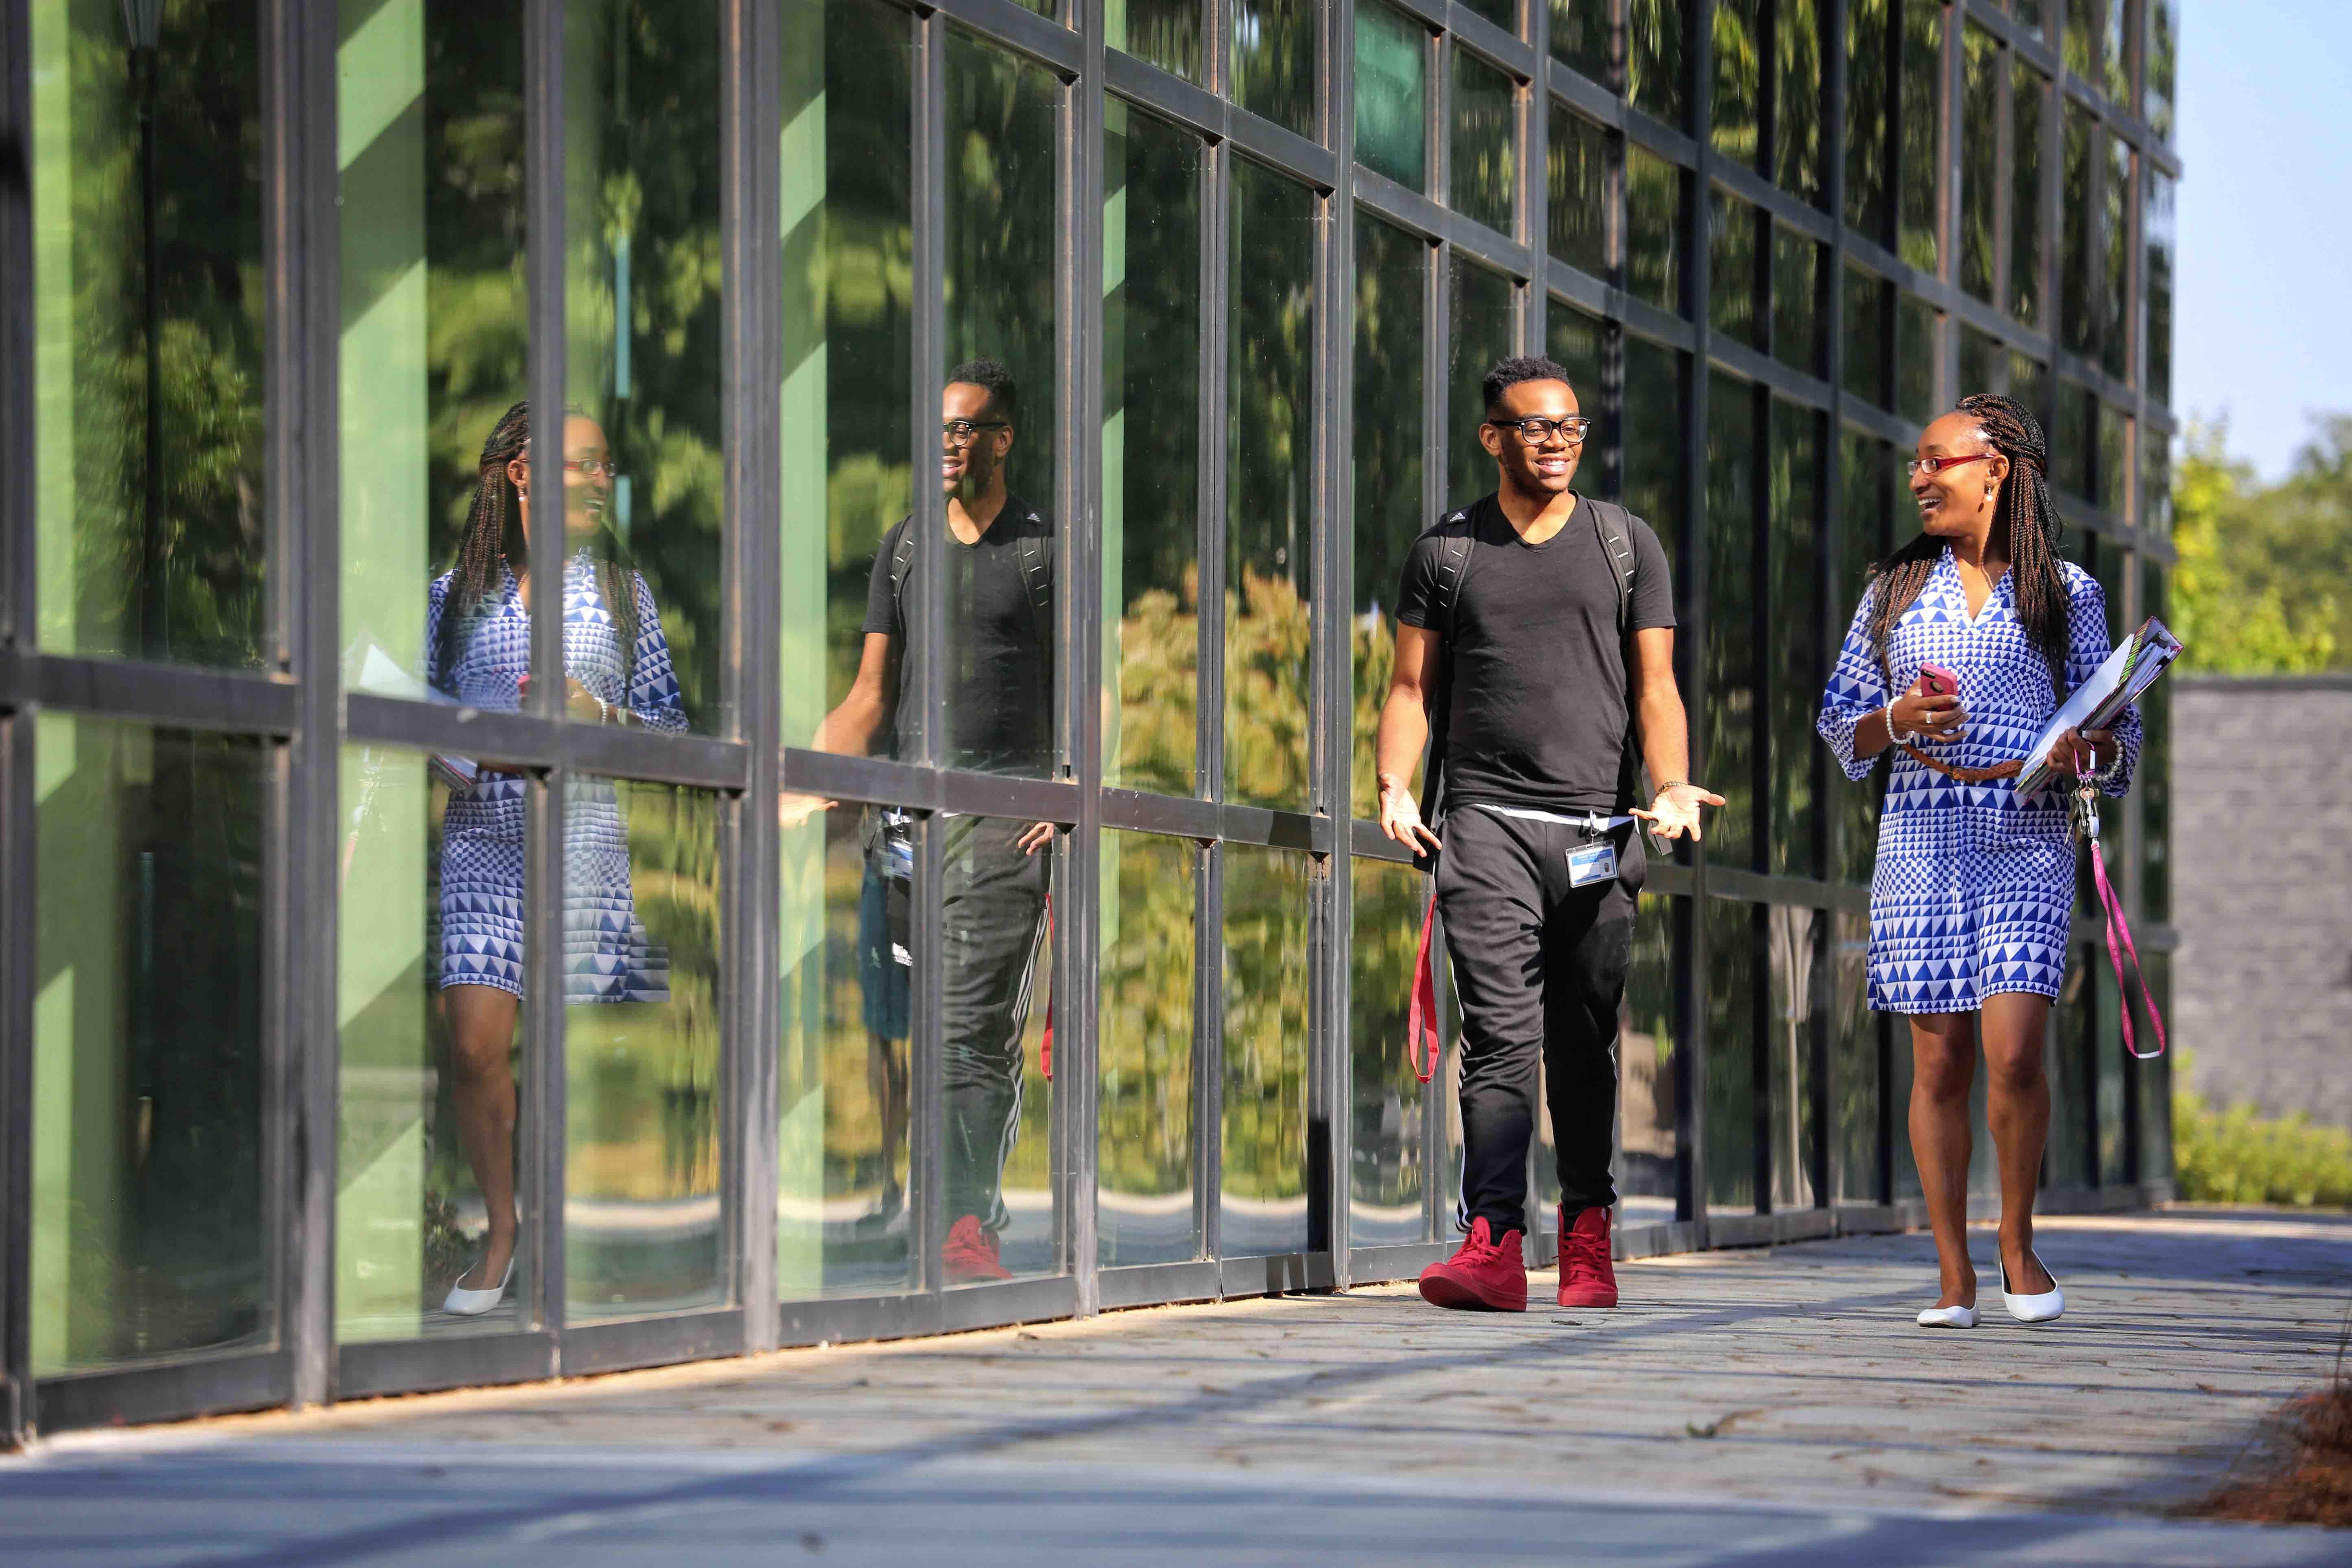 students-walking-glass-building.jpg